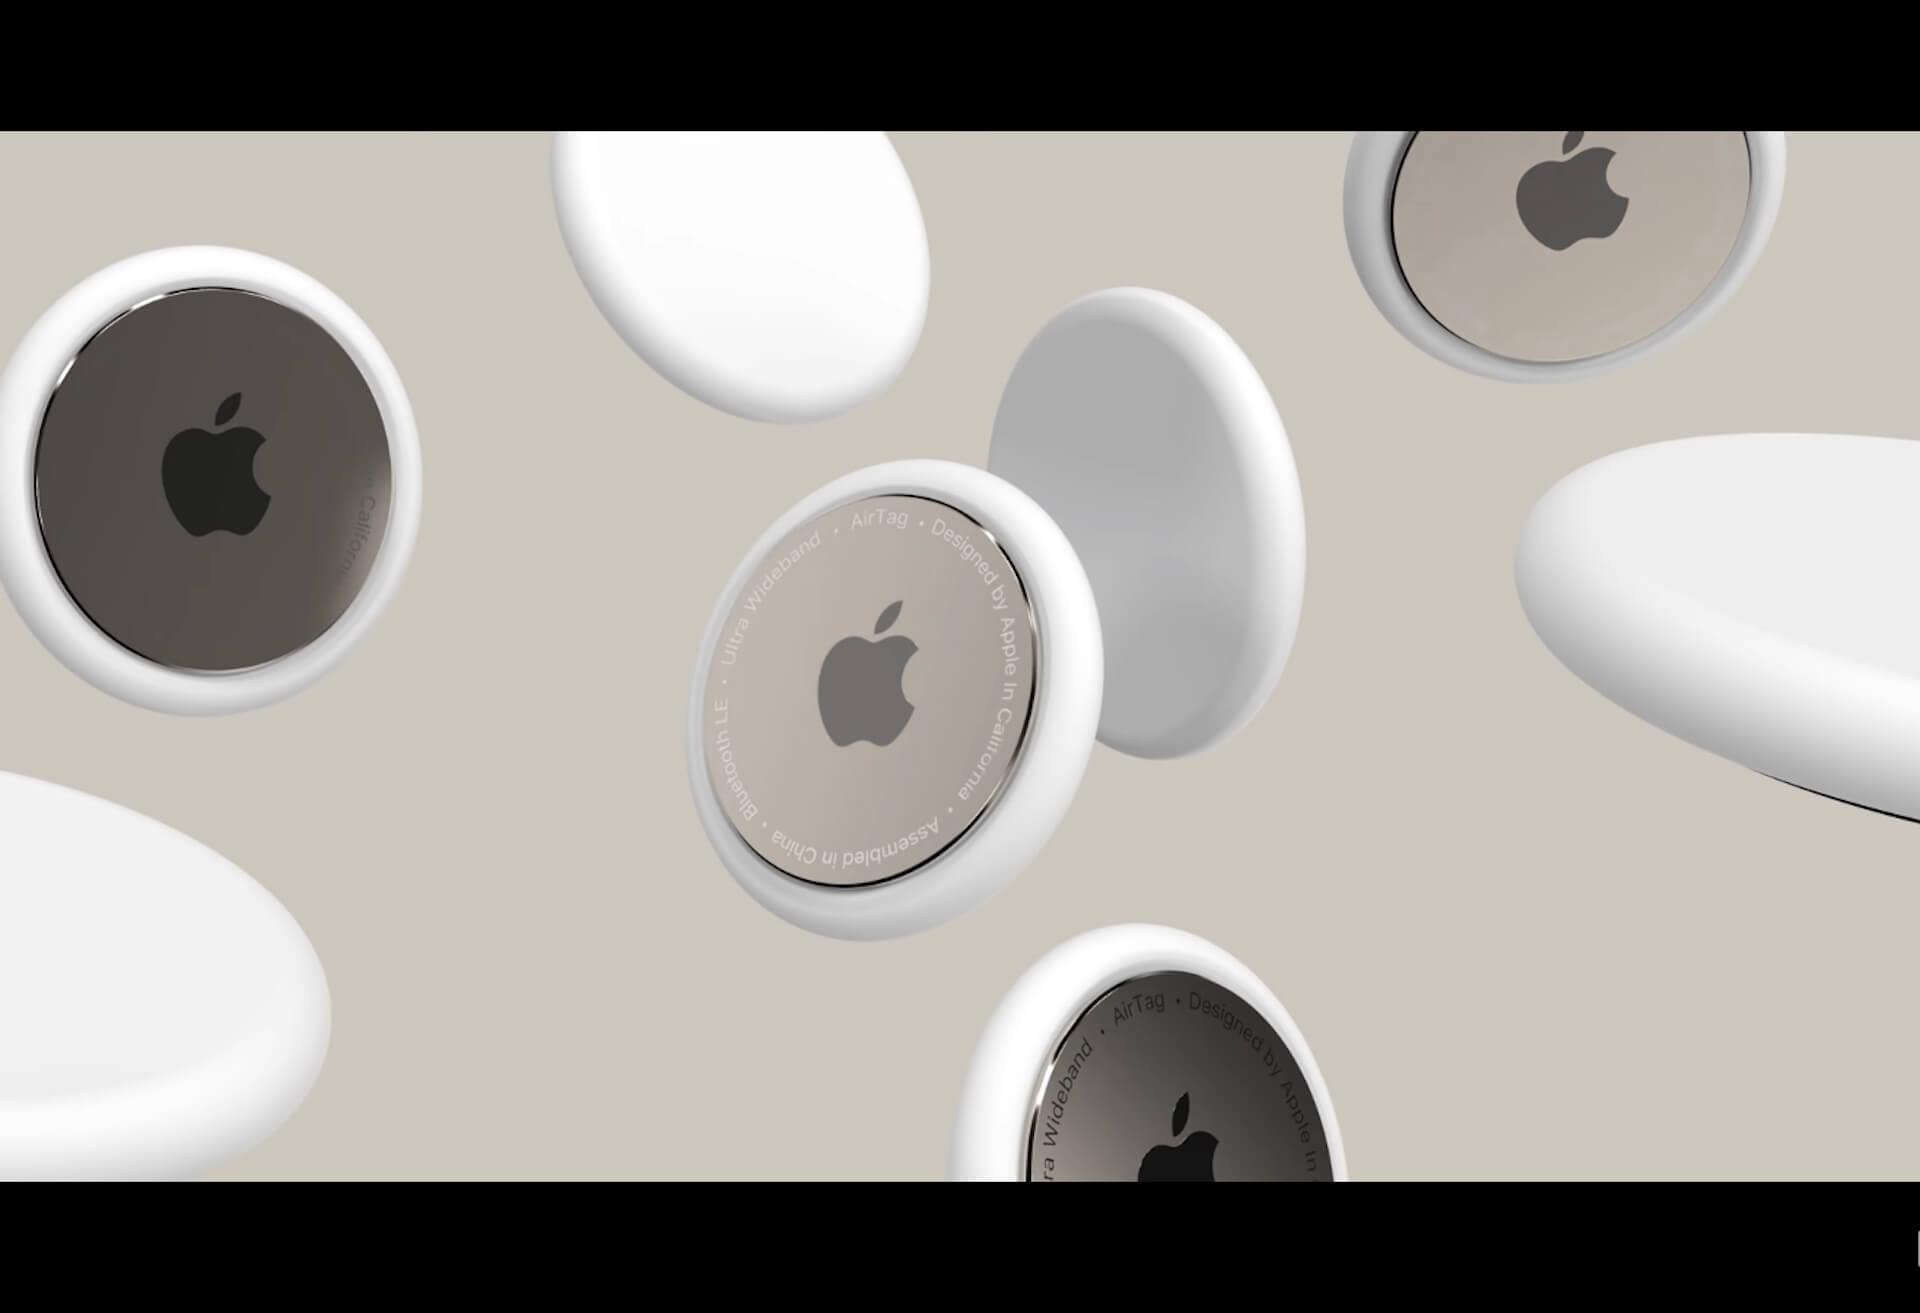 Appleが3月16日に製品発表イベント実施か!?AirTags、新型iPad、新型iPad mini発表の可能性も tech210219_airtags_ipad_main